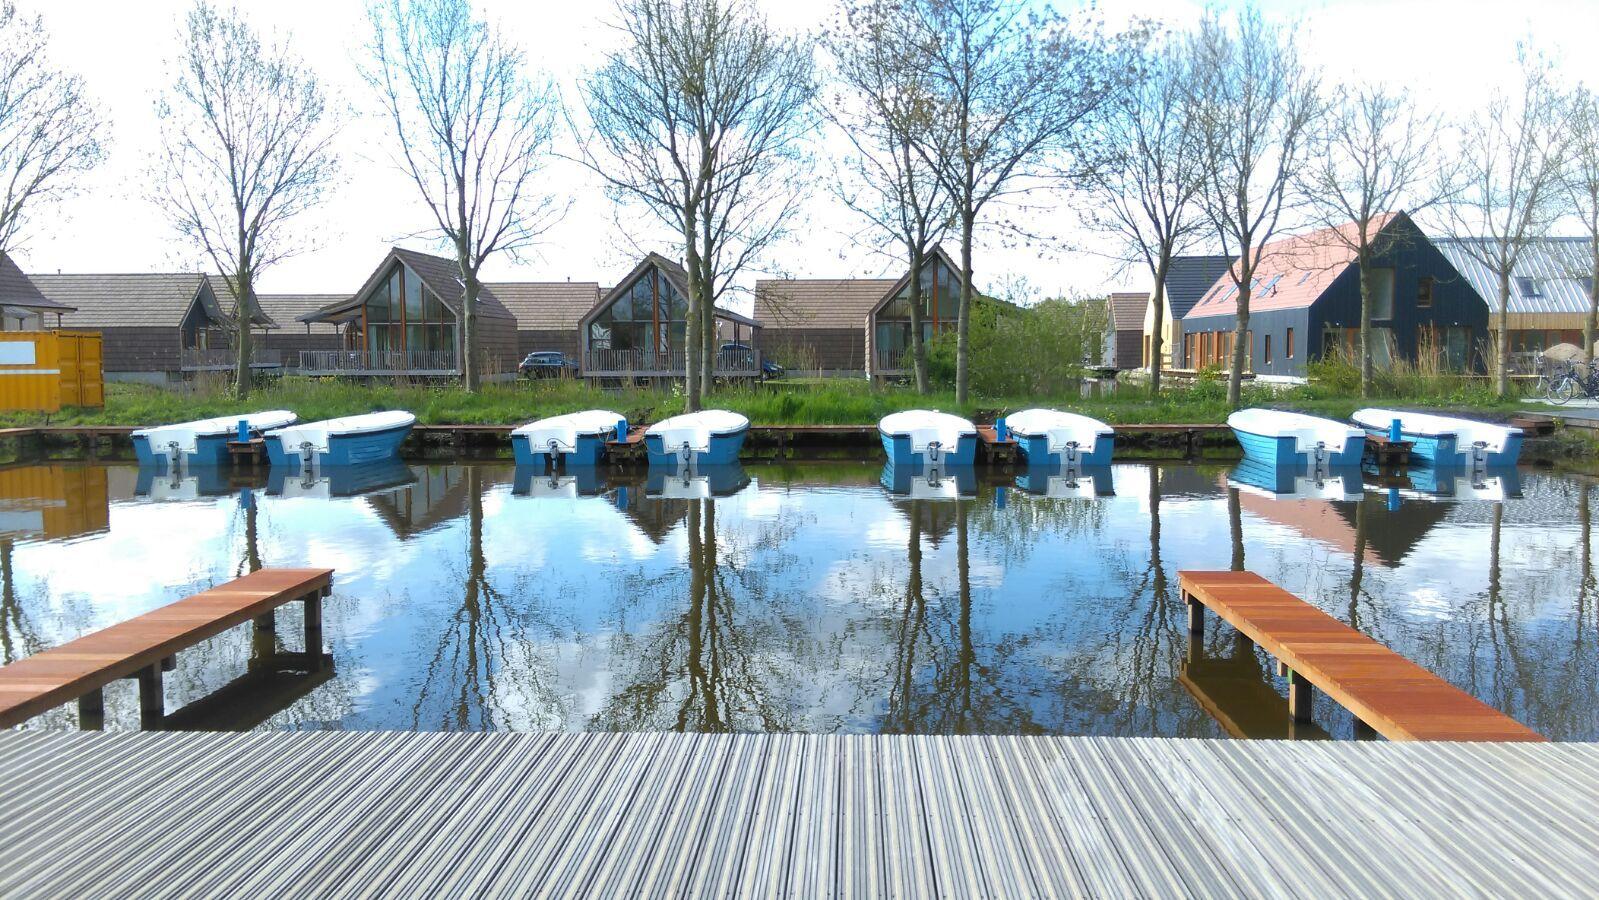 Boat rental -